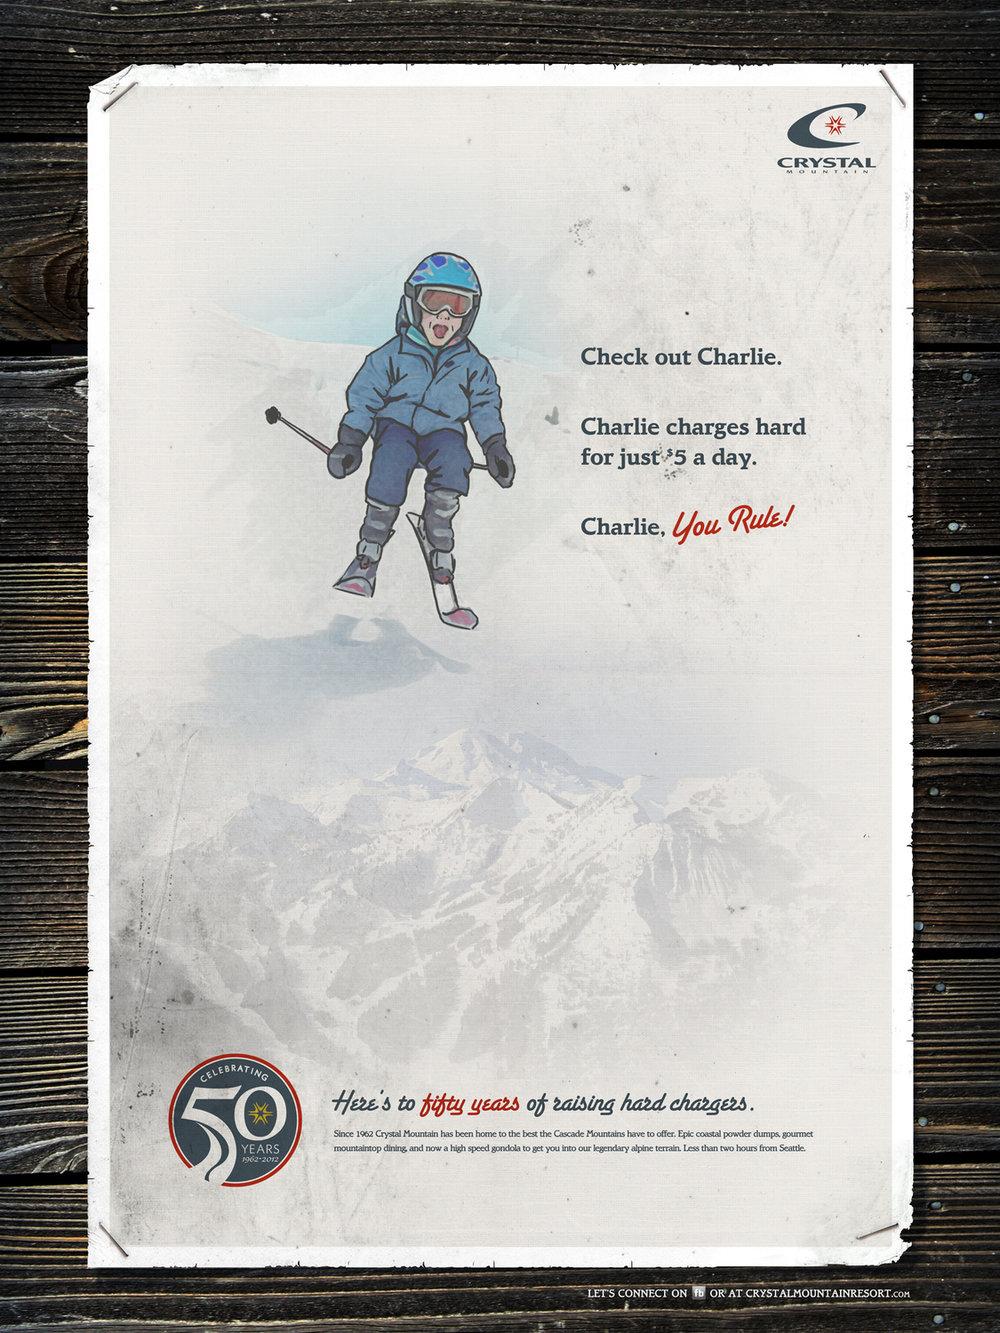 Crystal Mountain Print Advertising 05.jpg